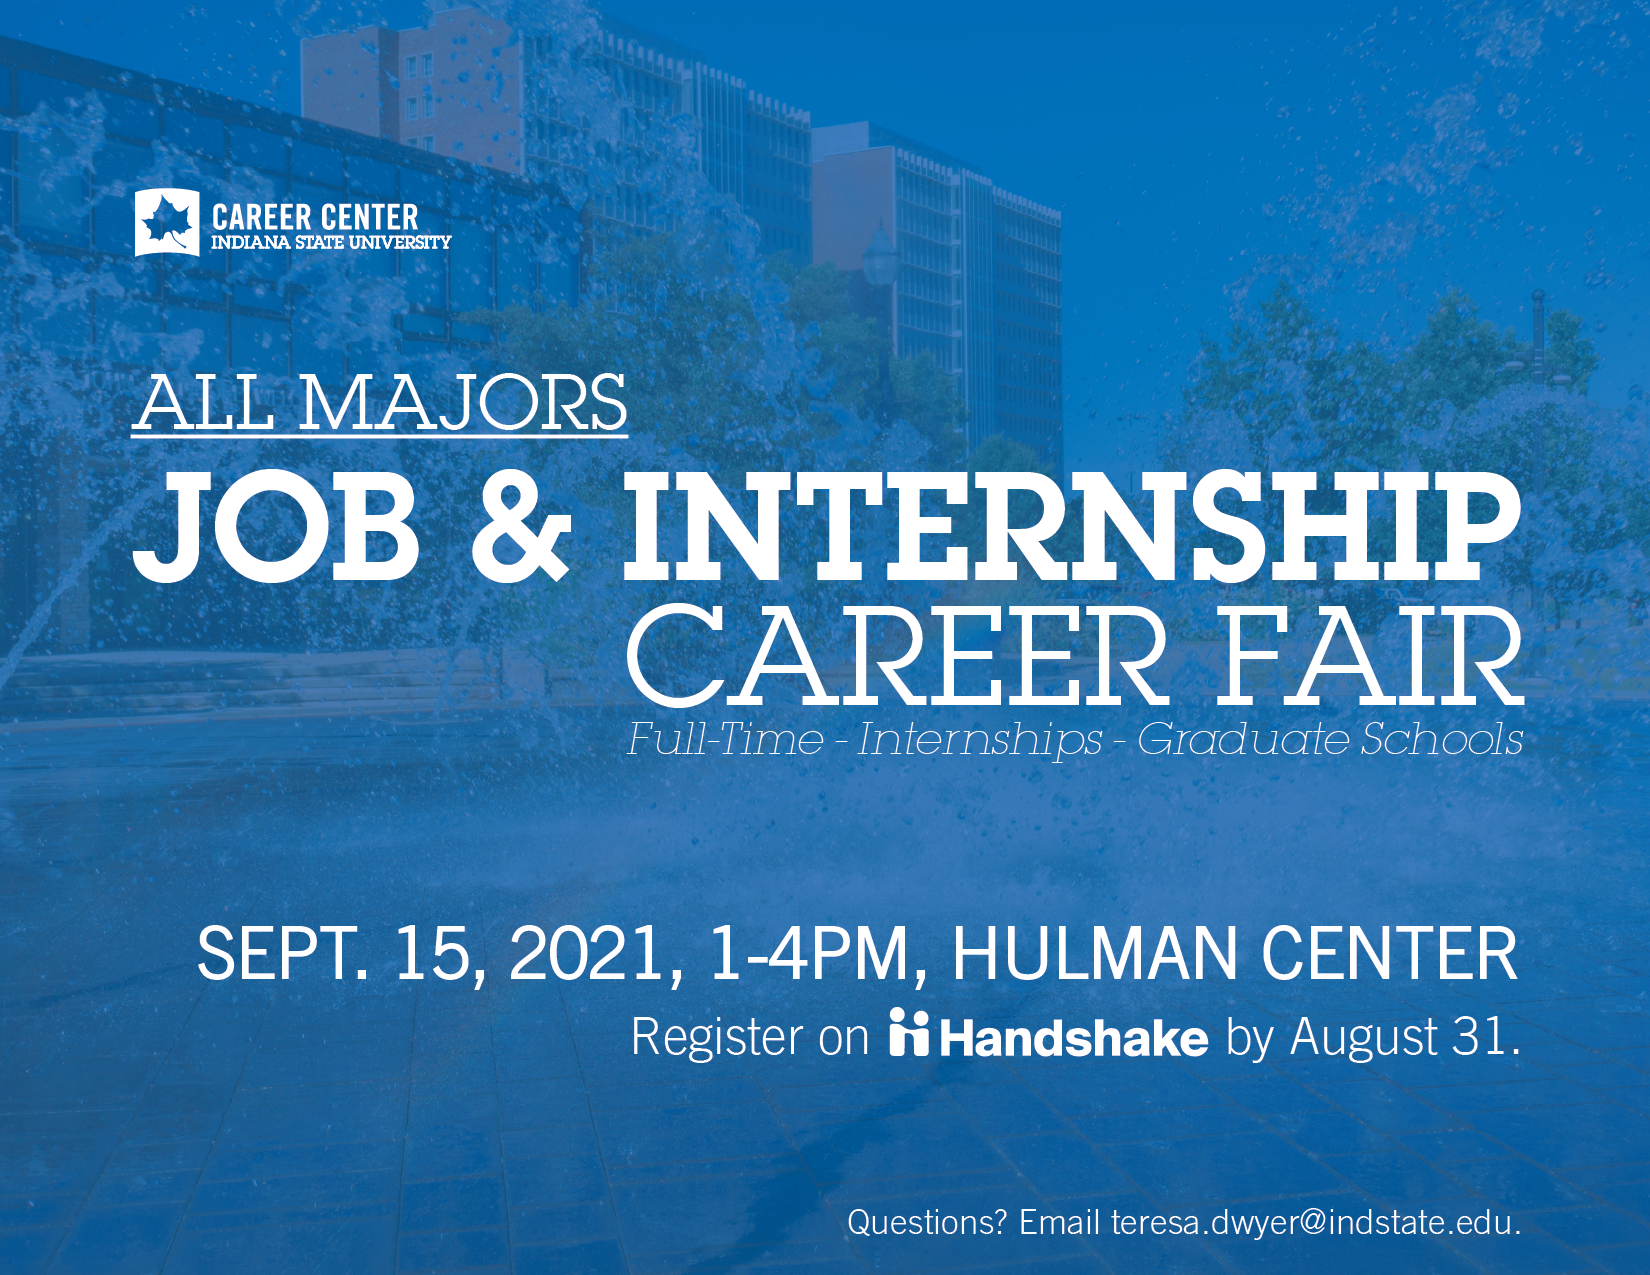 Employer_-_Fall_All_Majors_Job_&_Internship_Career_Fair[1].png